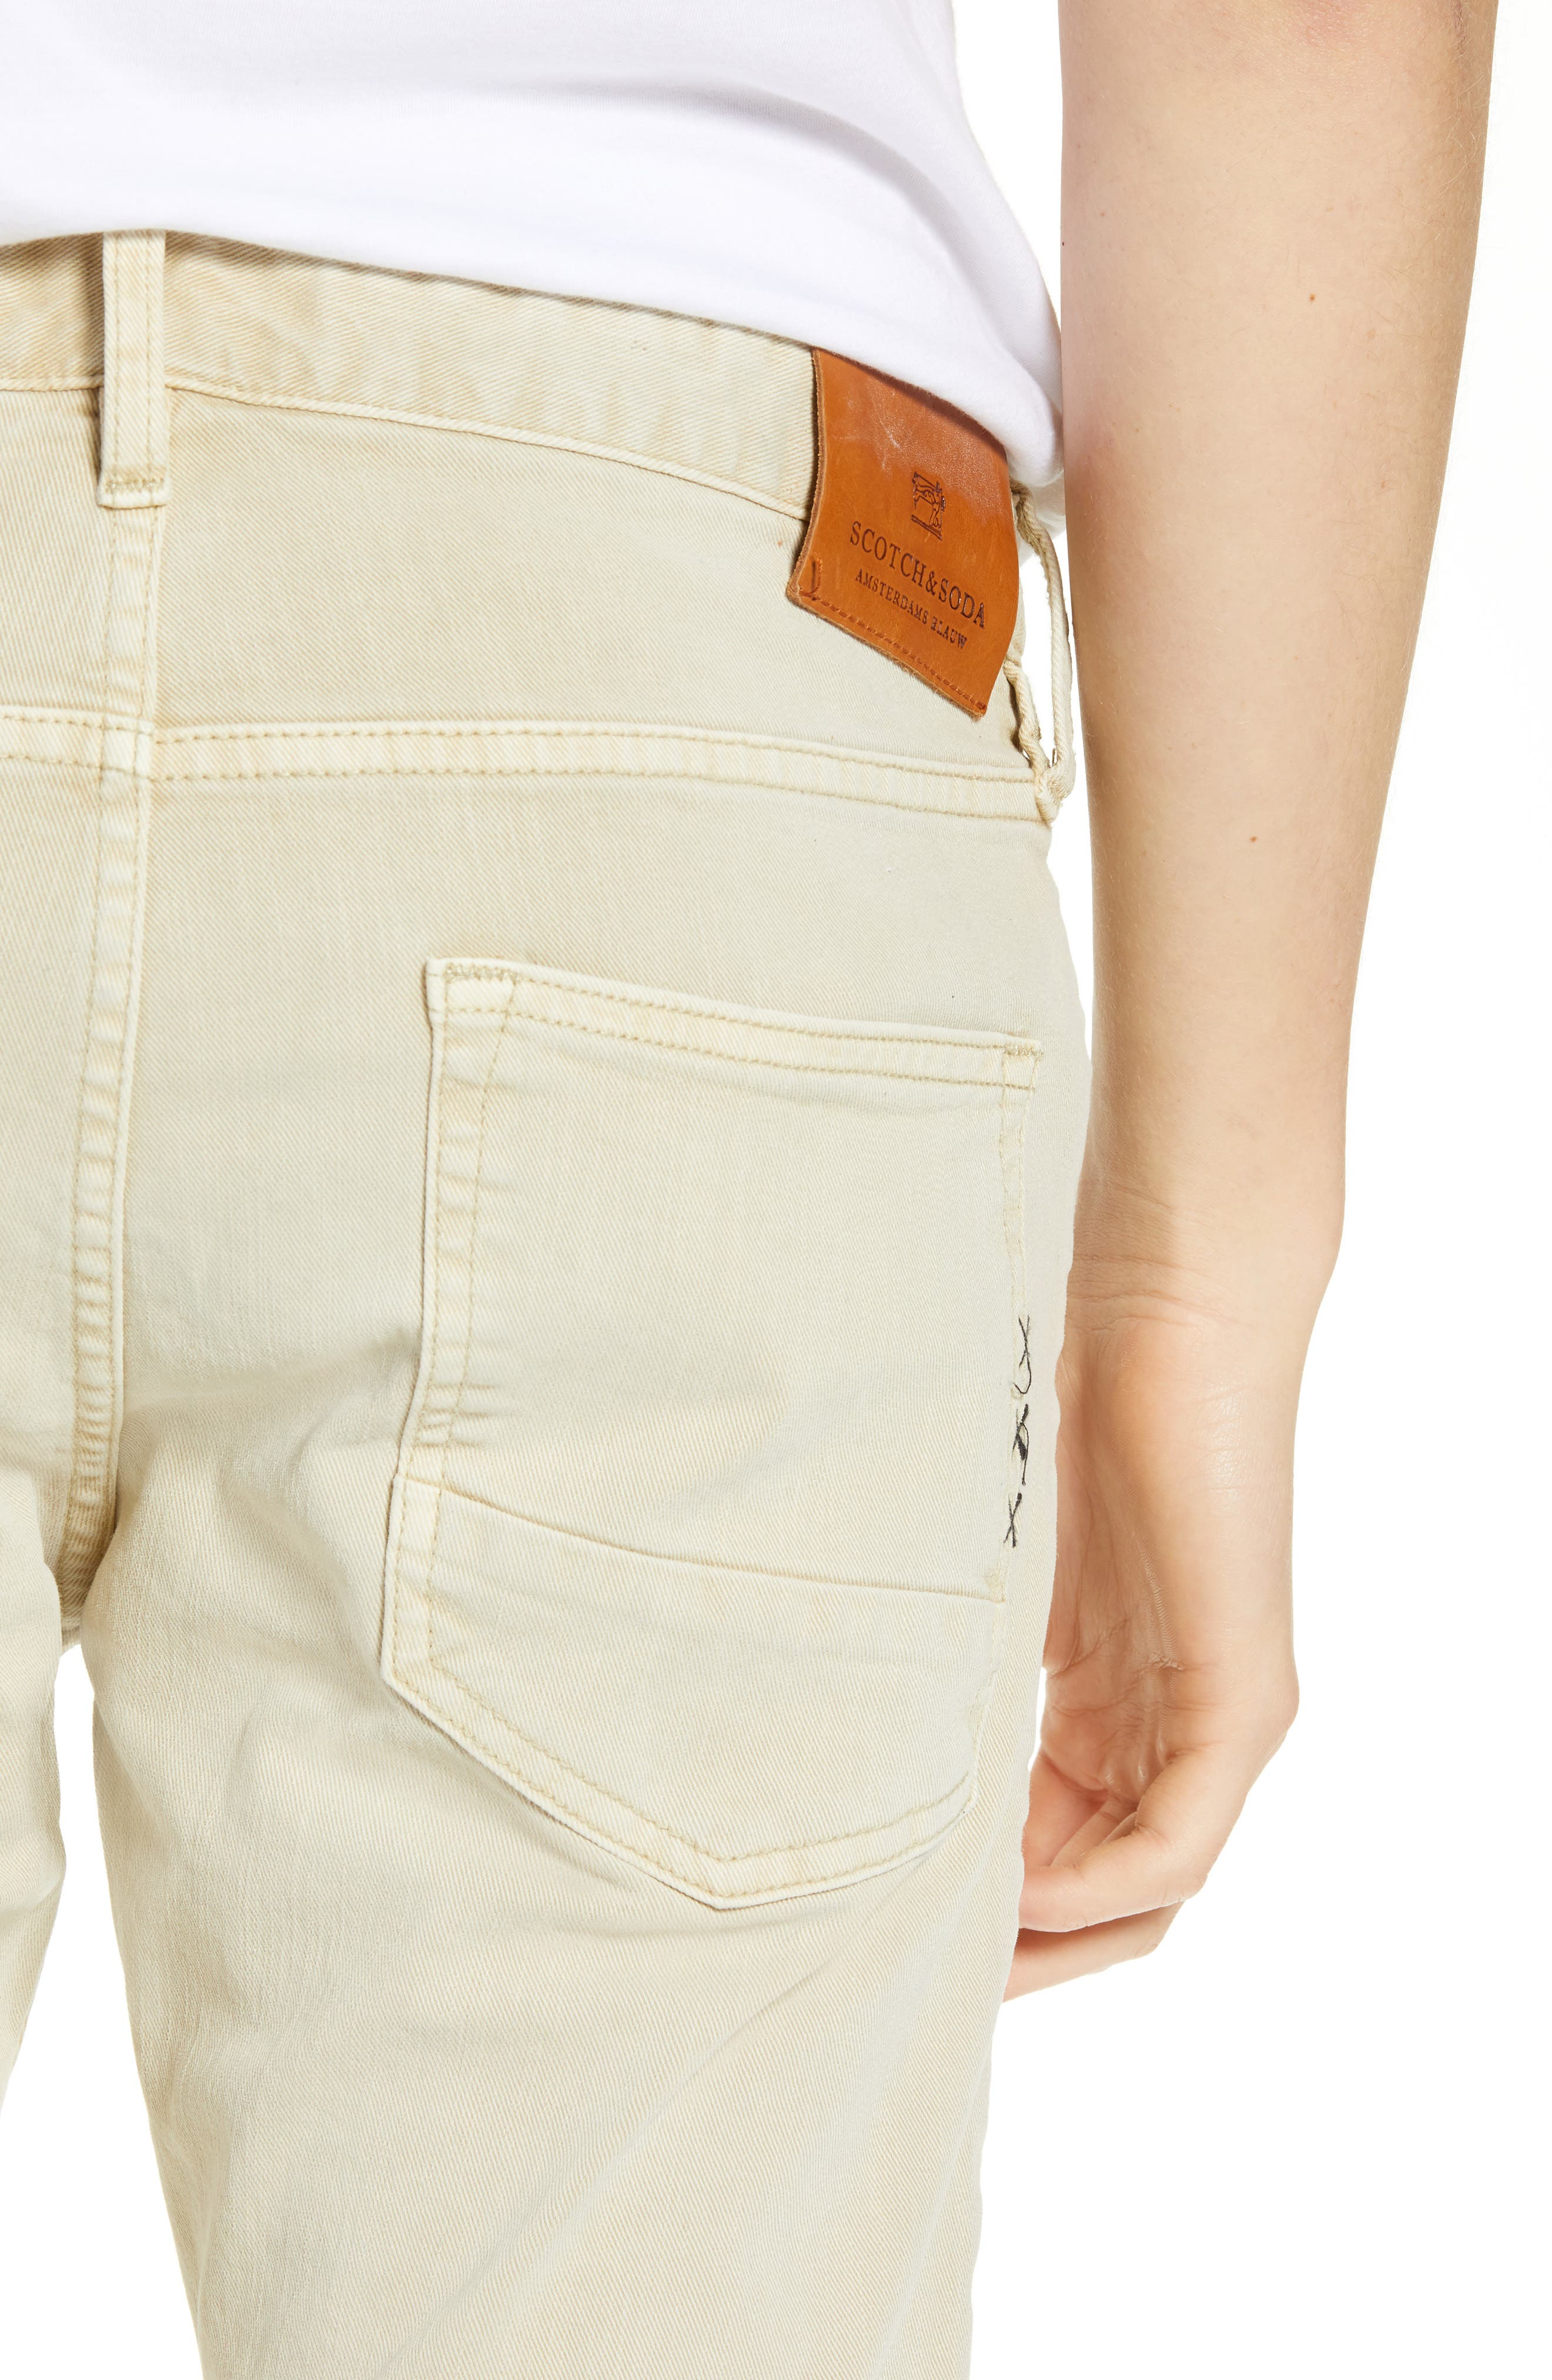 Ralston Slim Fit Pants,                             Alternate thumbnail 4, color,                             SAND